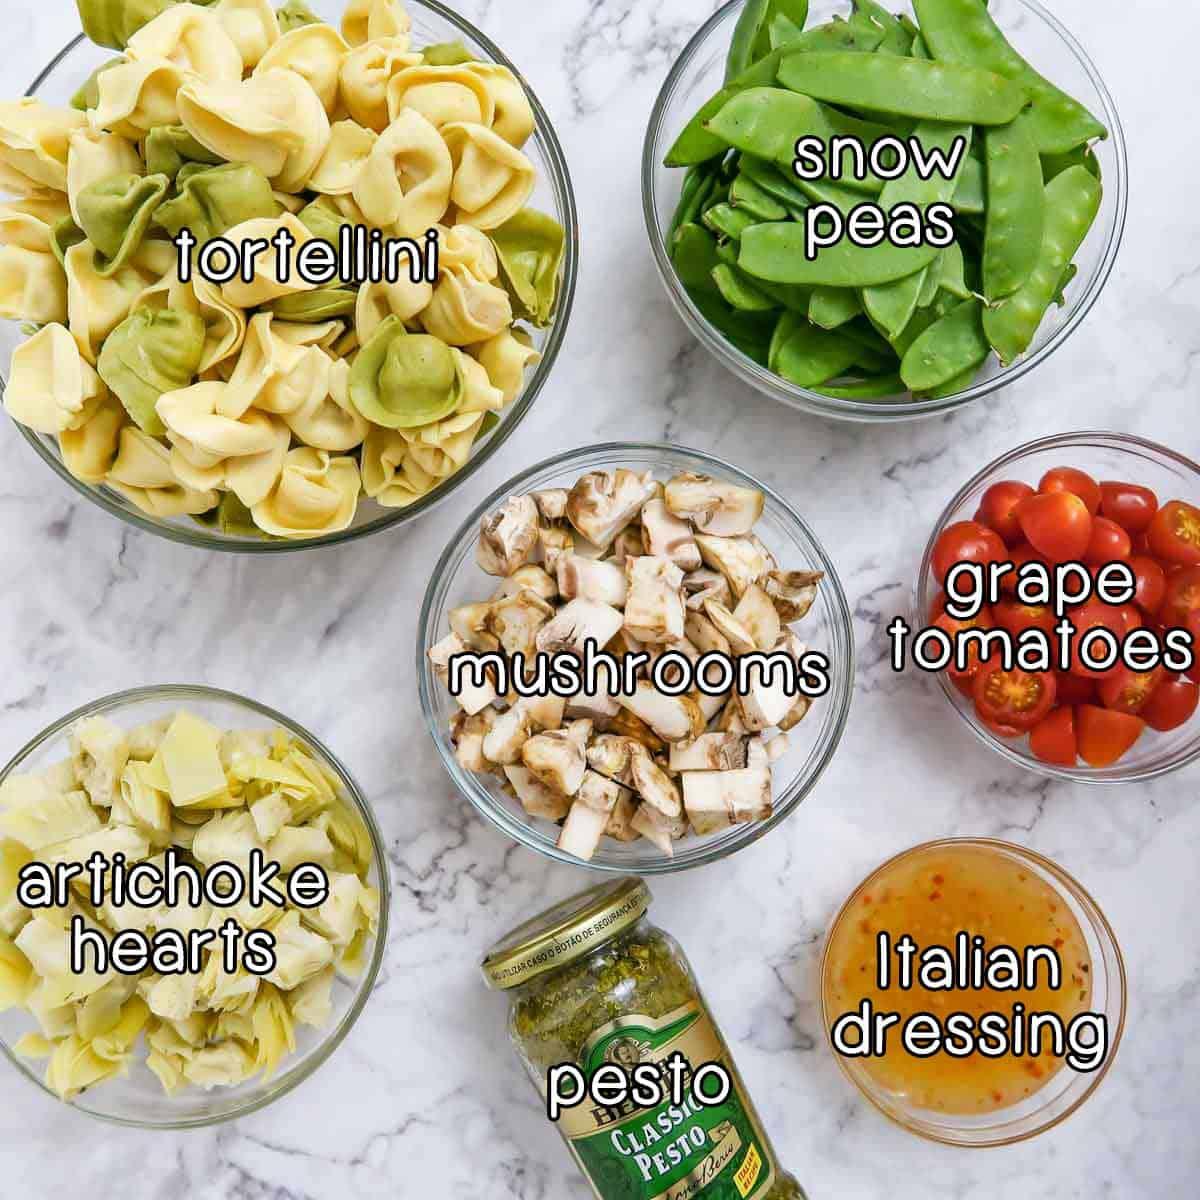 Overhead shot of ingredients- tortellini, snow peas, mushrooms, grape tomatoes, artichoke hearts, pesto, and Italian dressing.